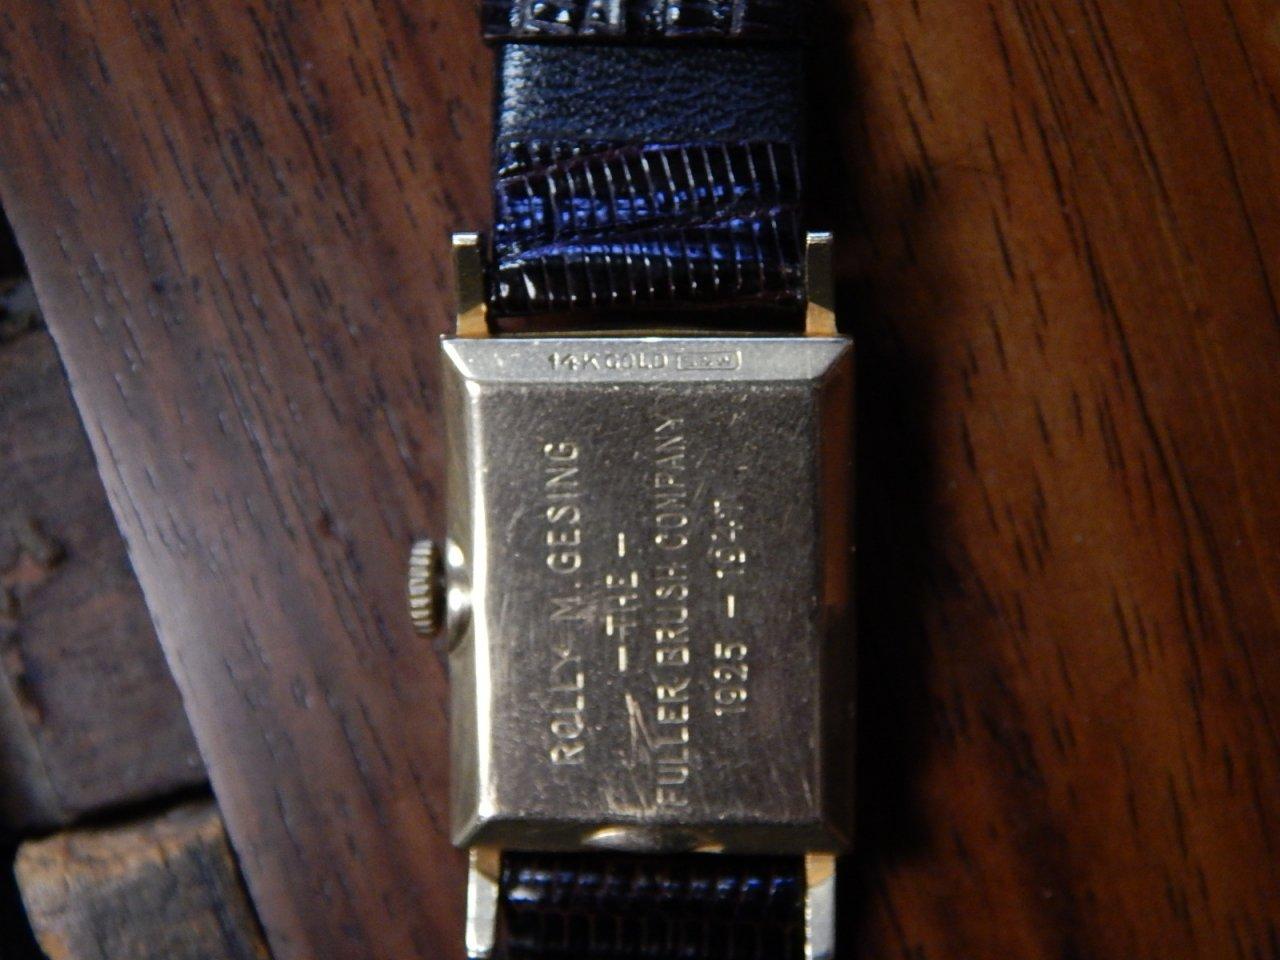 Hamilton 14k Gold Watch